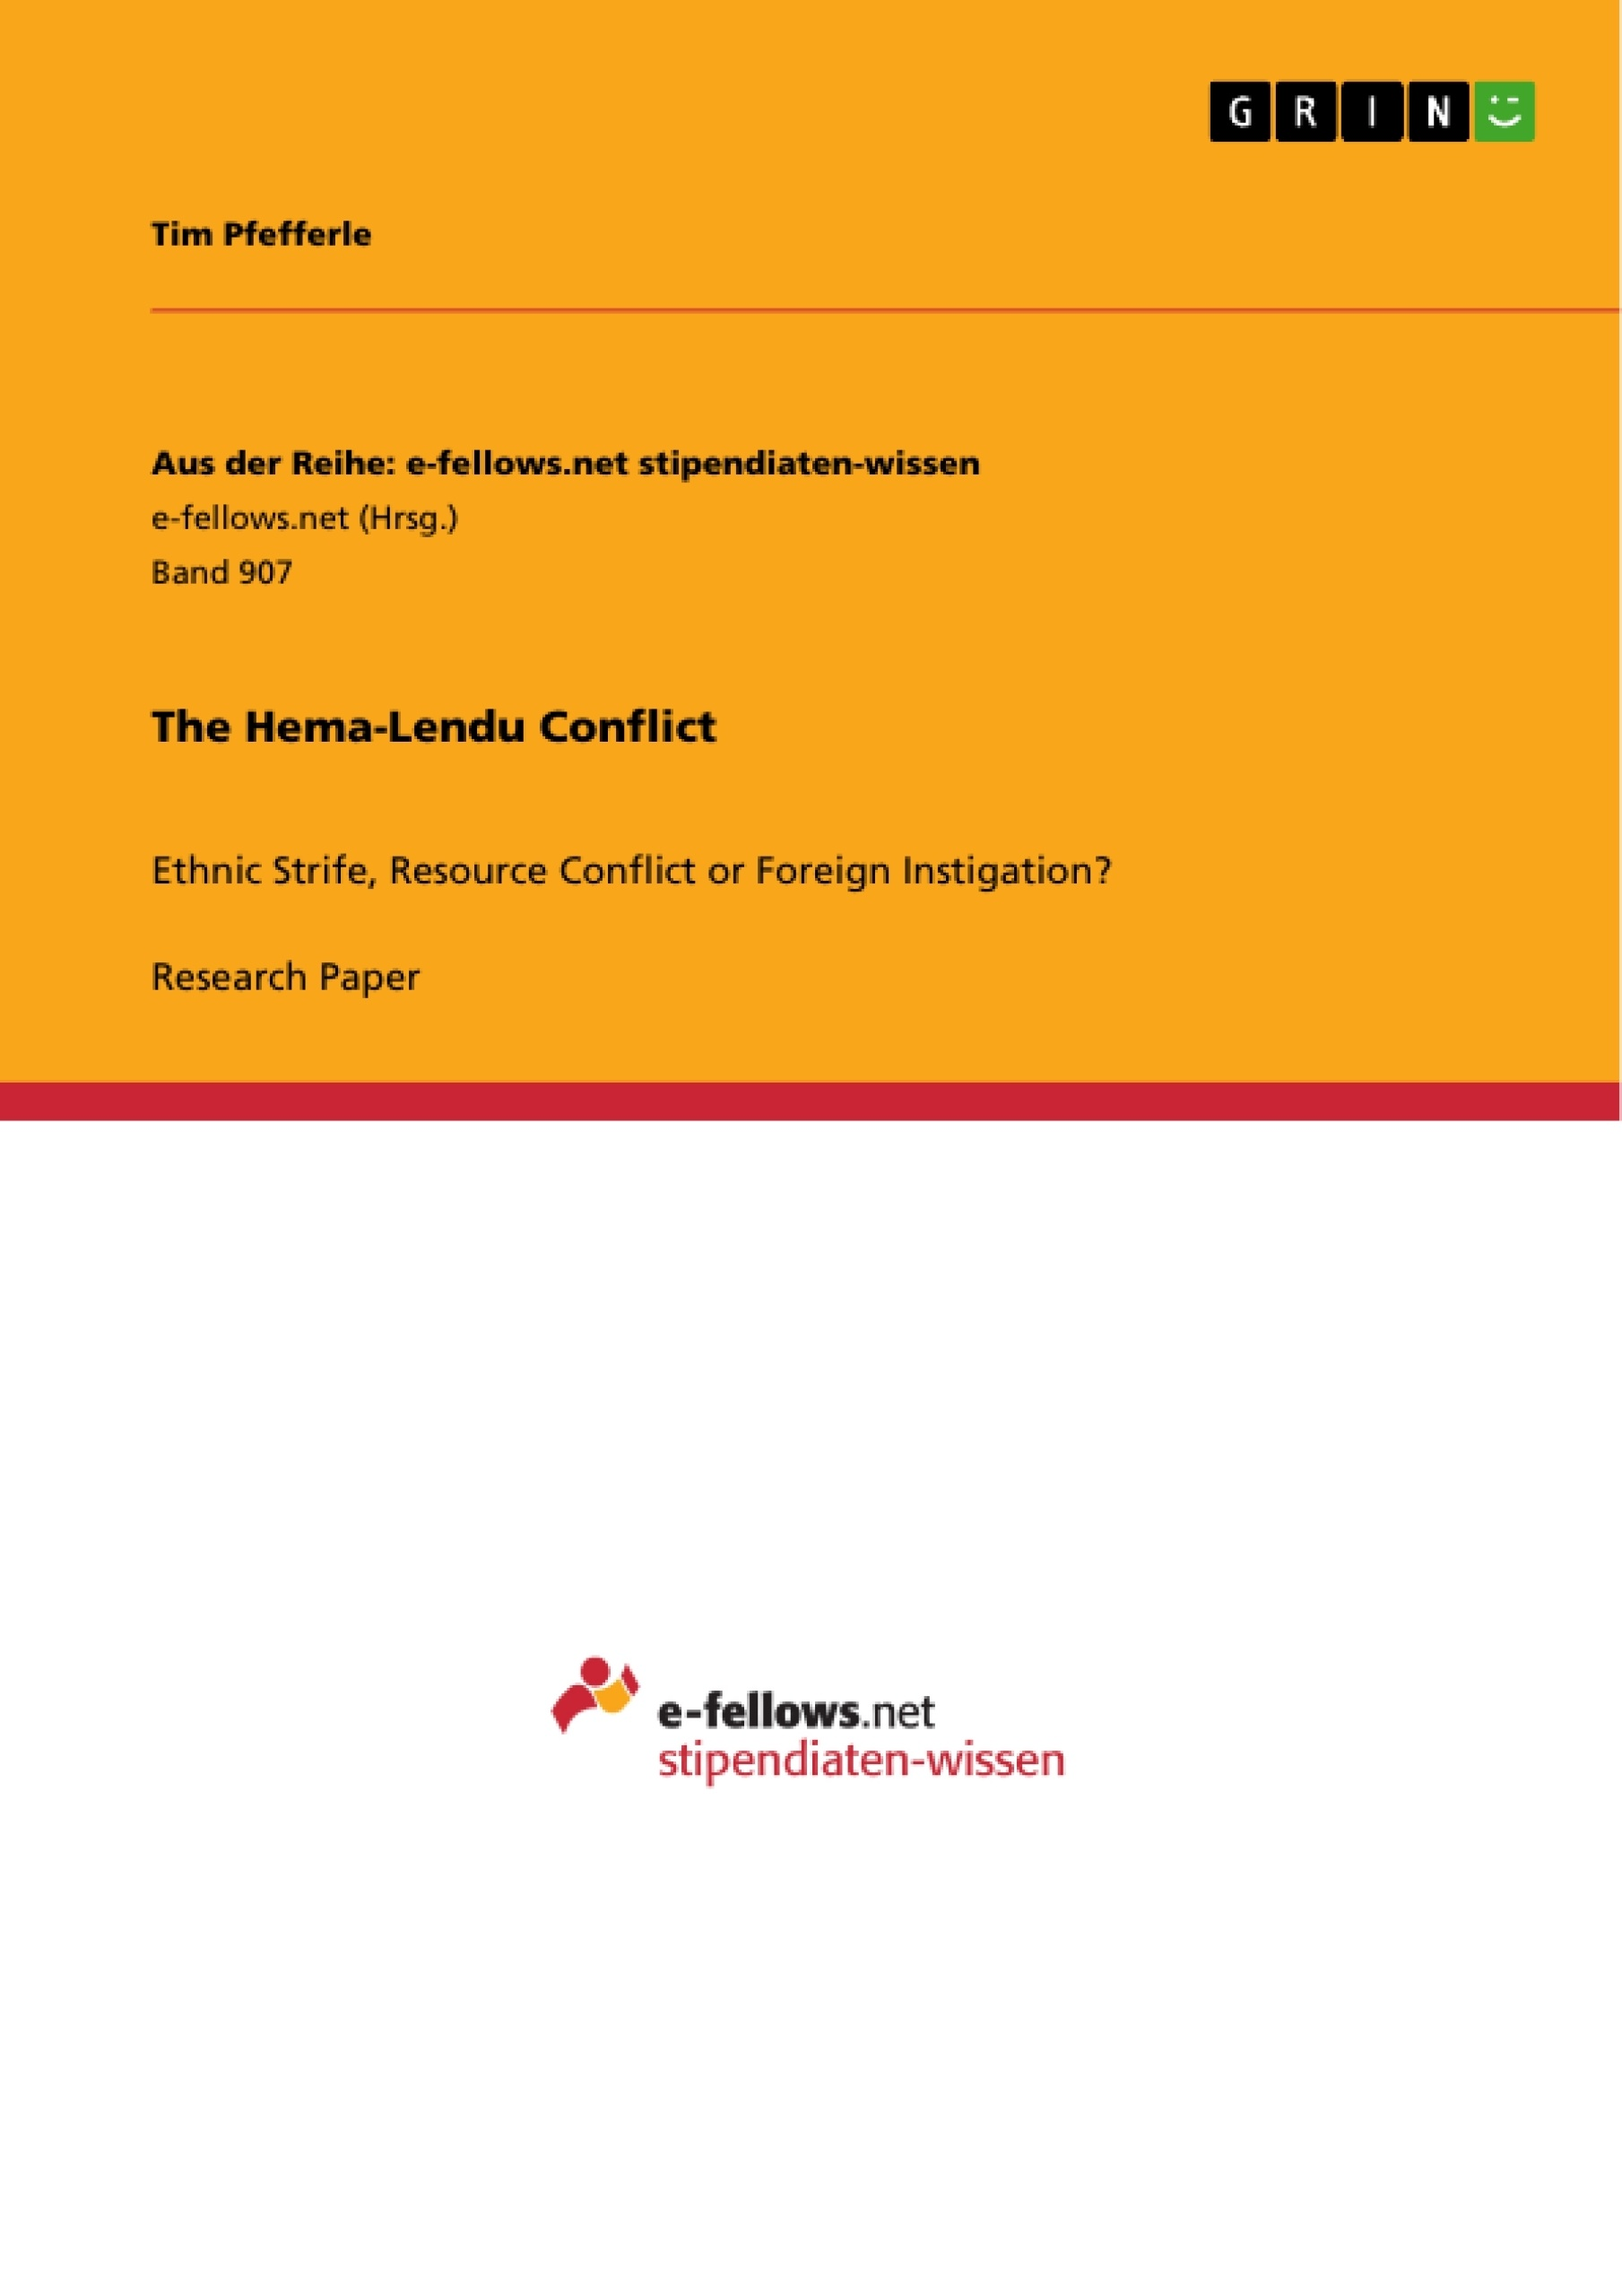 Title: The Hema-Lendu Conflict